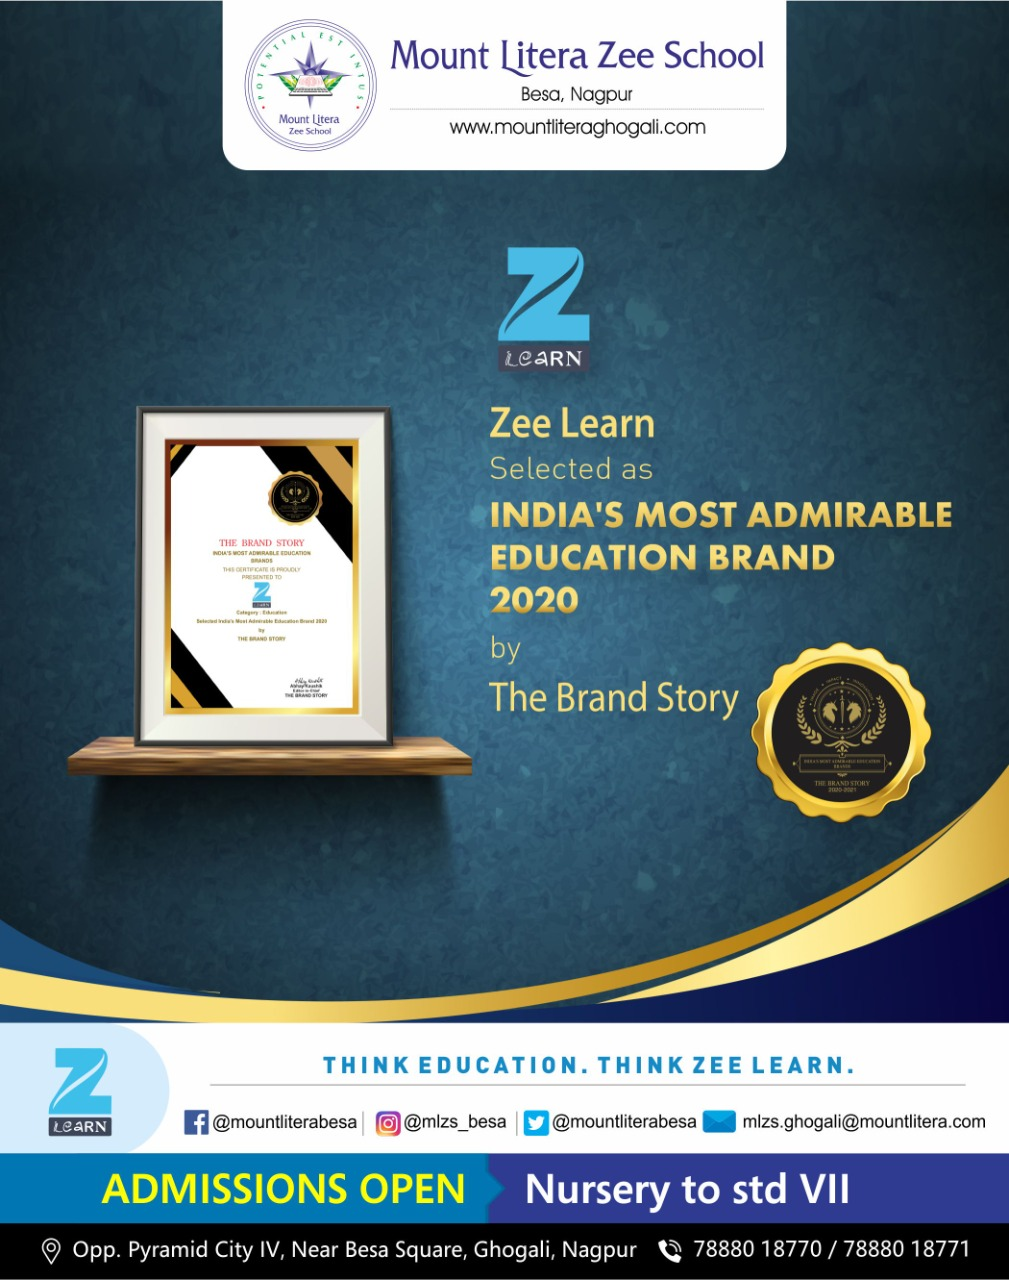 Events-MLZS Goa